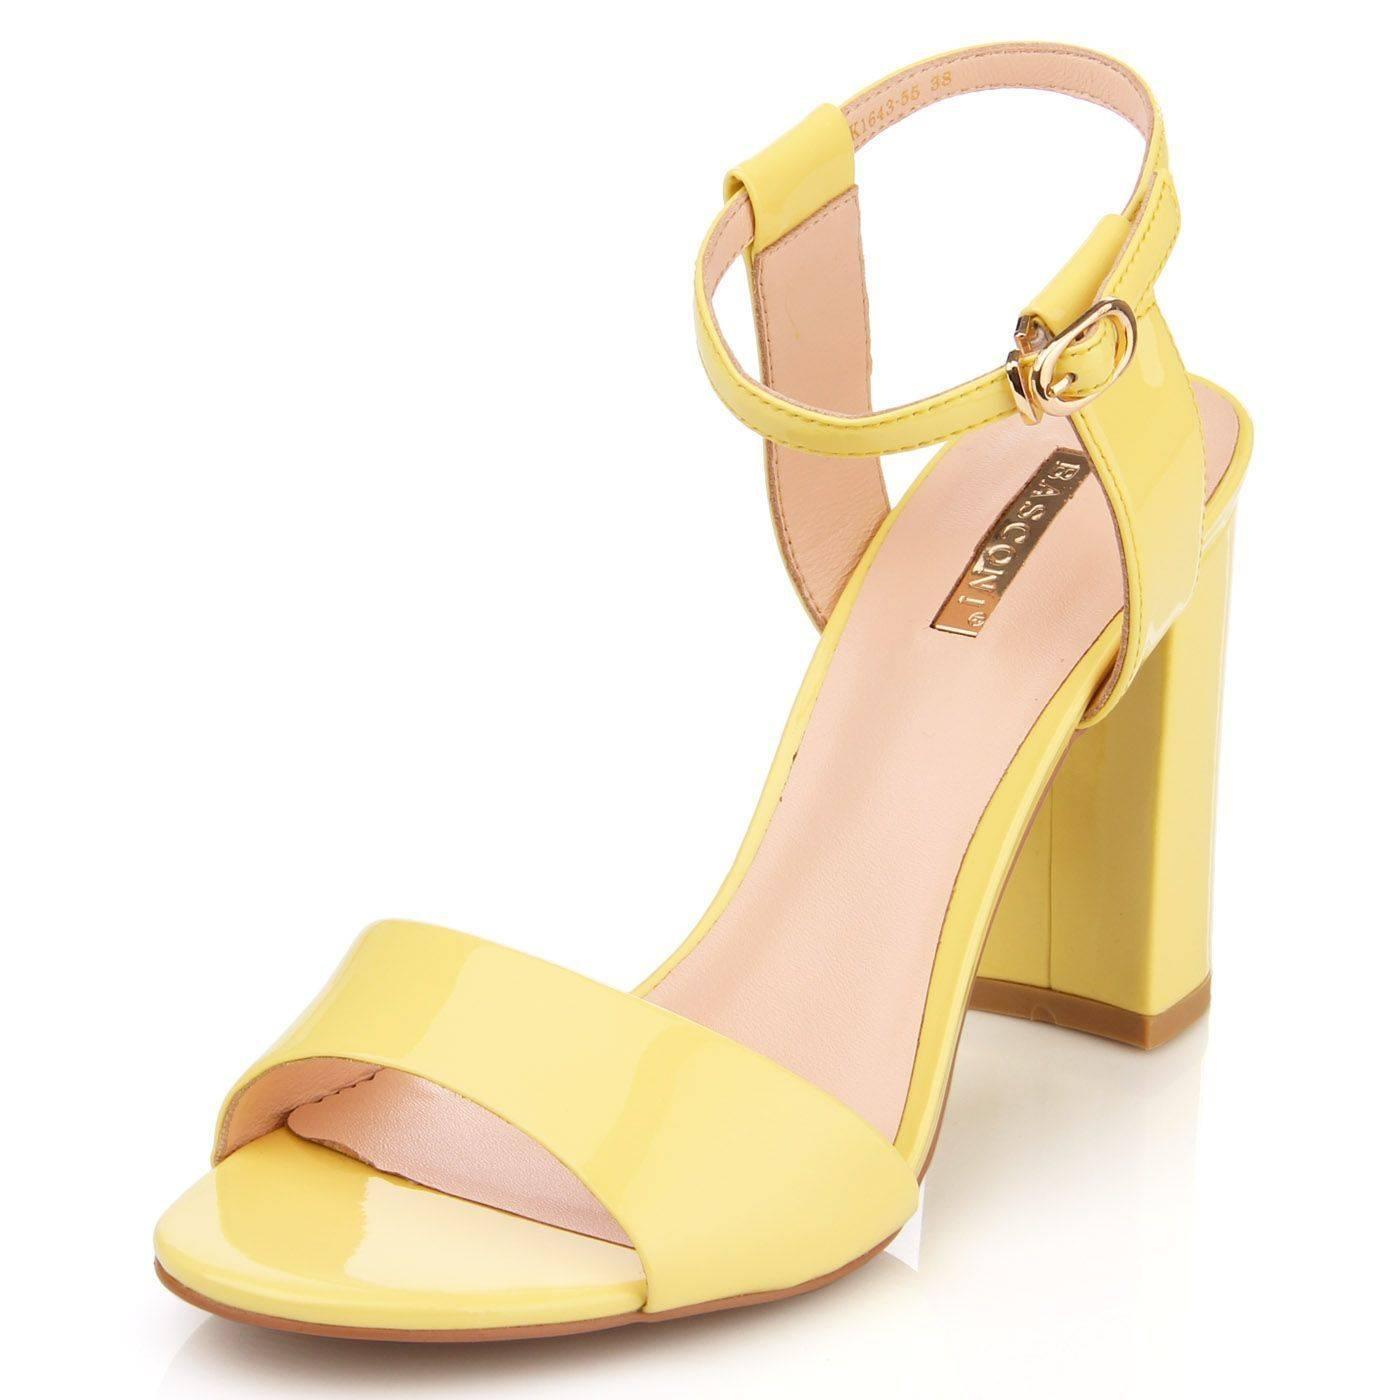 e13c77a379d307 Босоніжки жіночі Basconi 5030 Жовтий купить по выгодной цене в ...